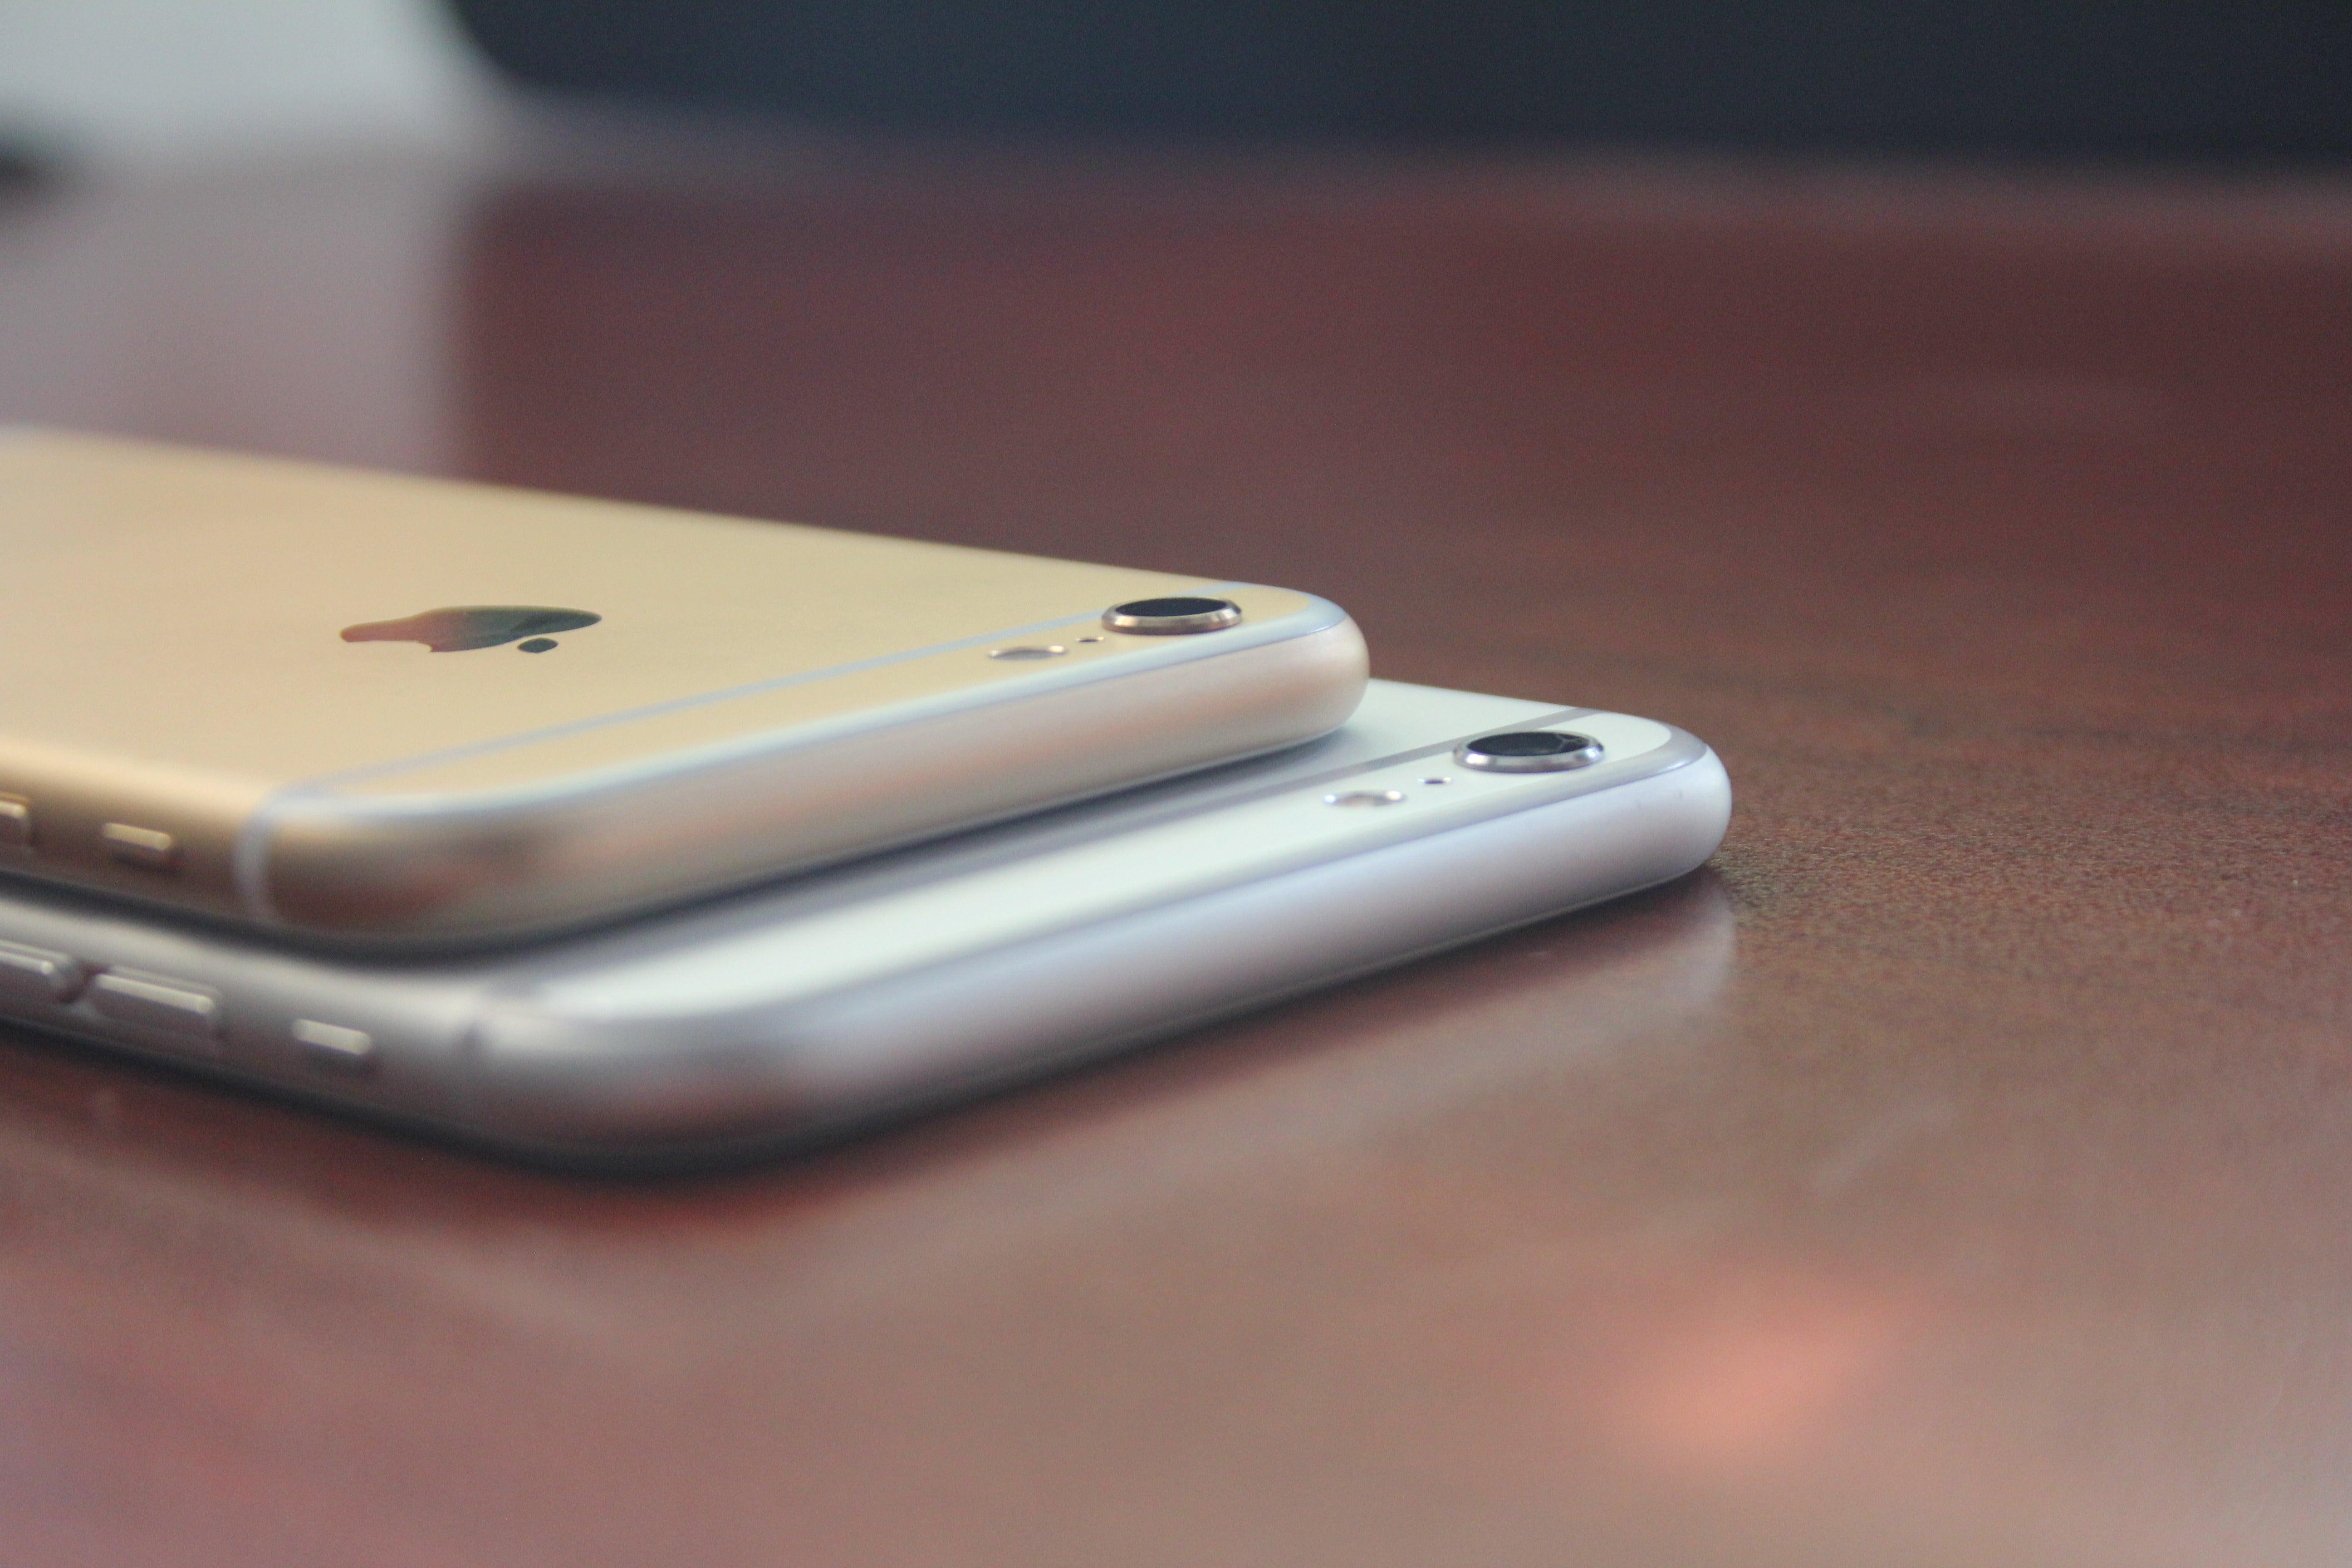 22df76882b6319 Record broken: iPhone 6, iPhone 6 Plus sales top 10 million in ...